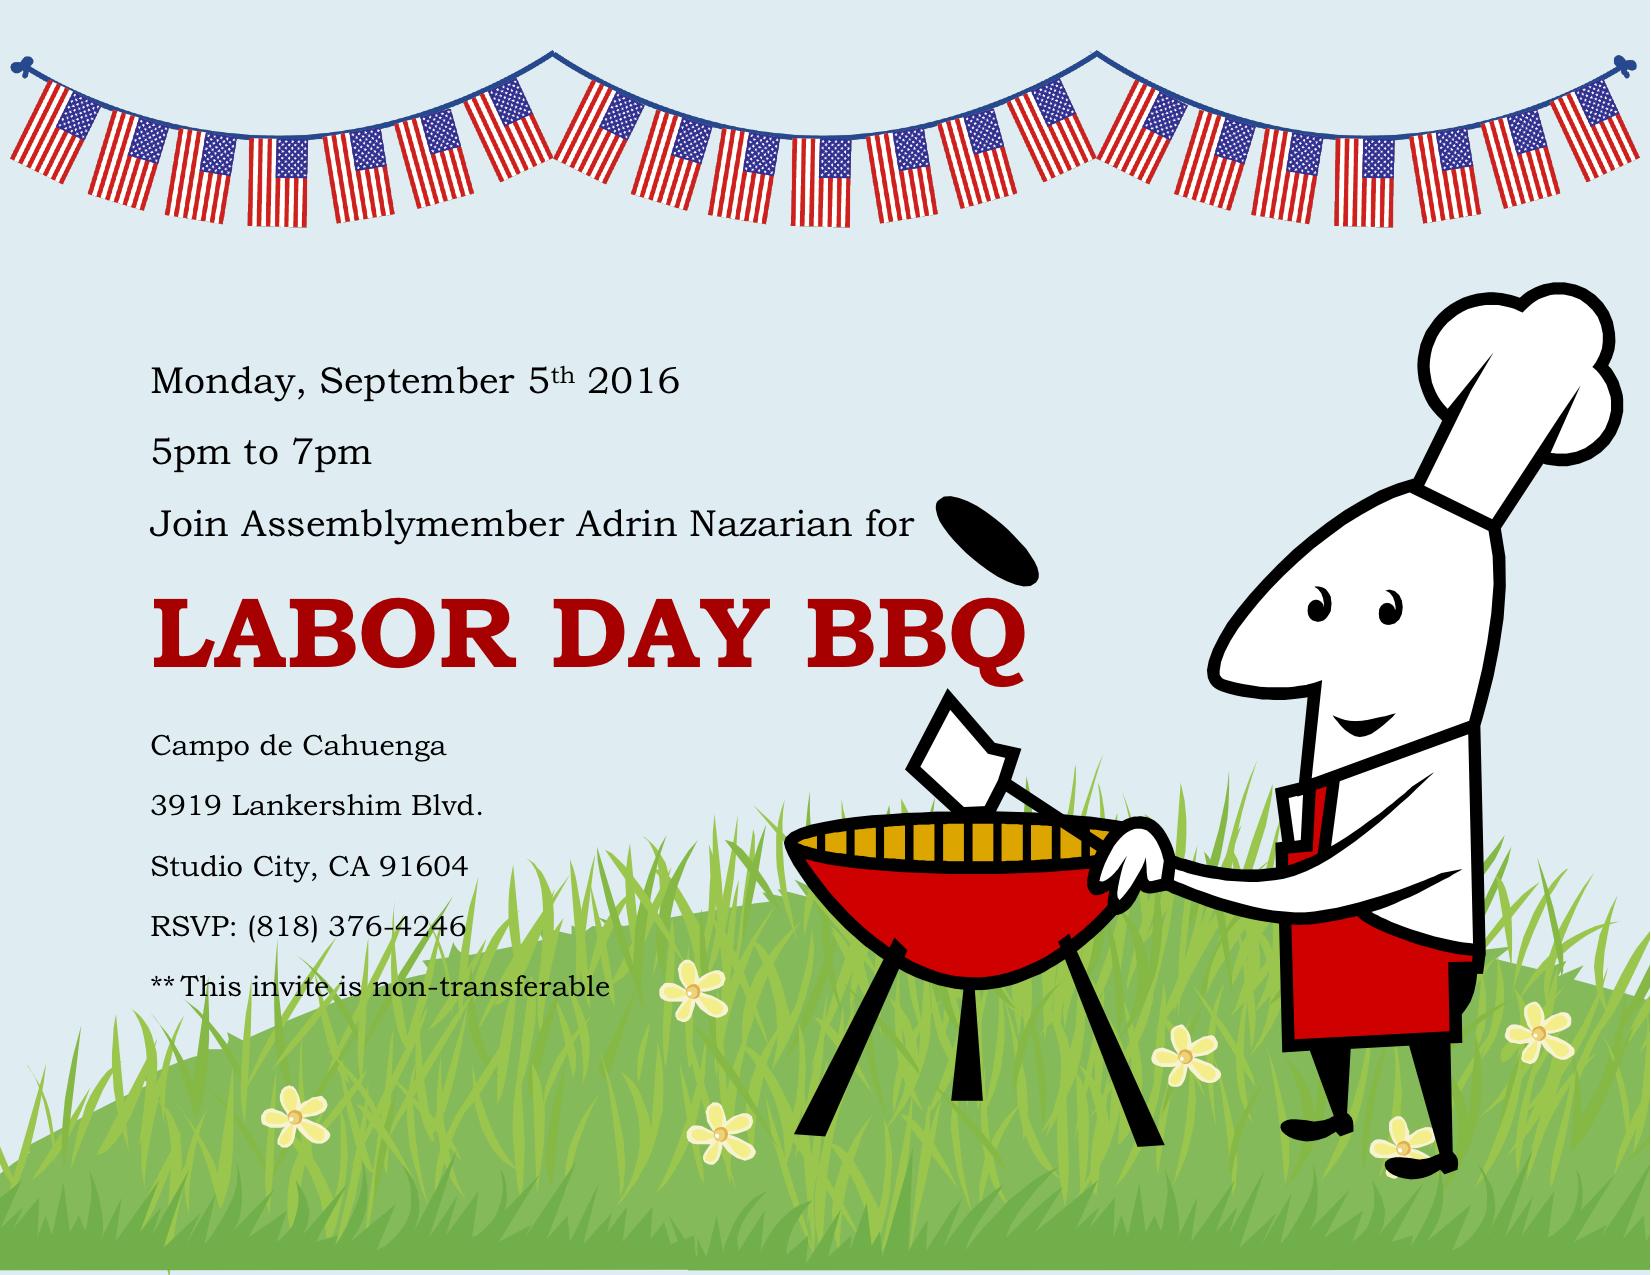 Labor-Day-BBQ 2016 flyer